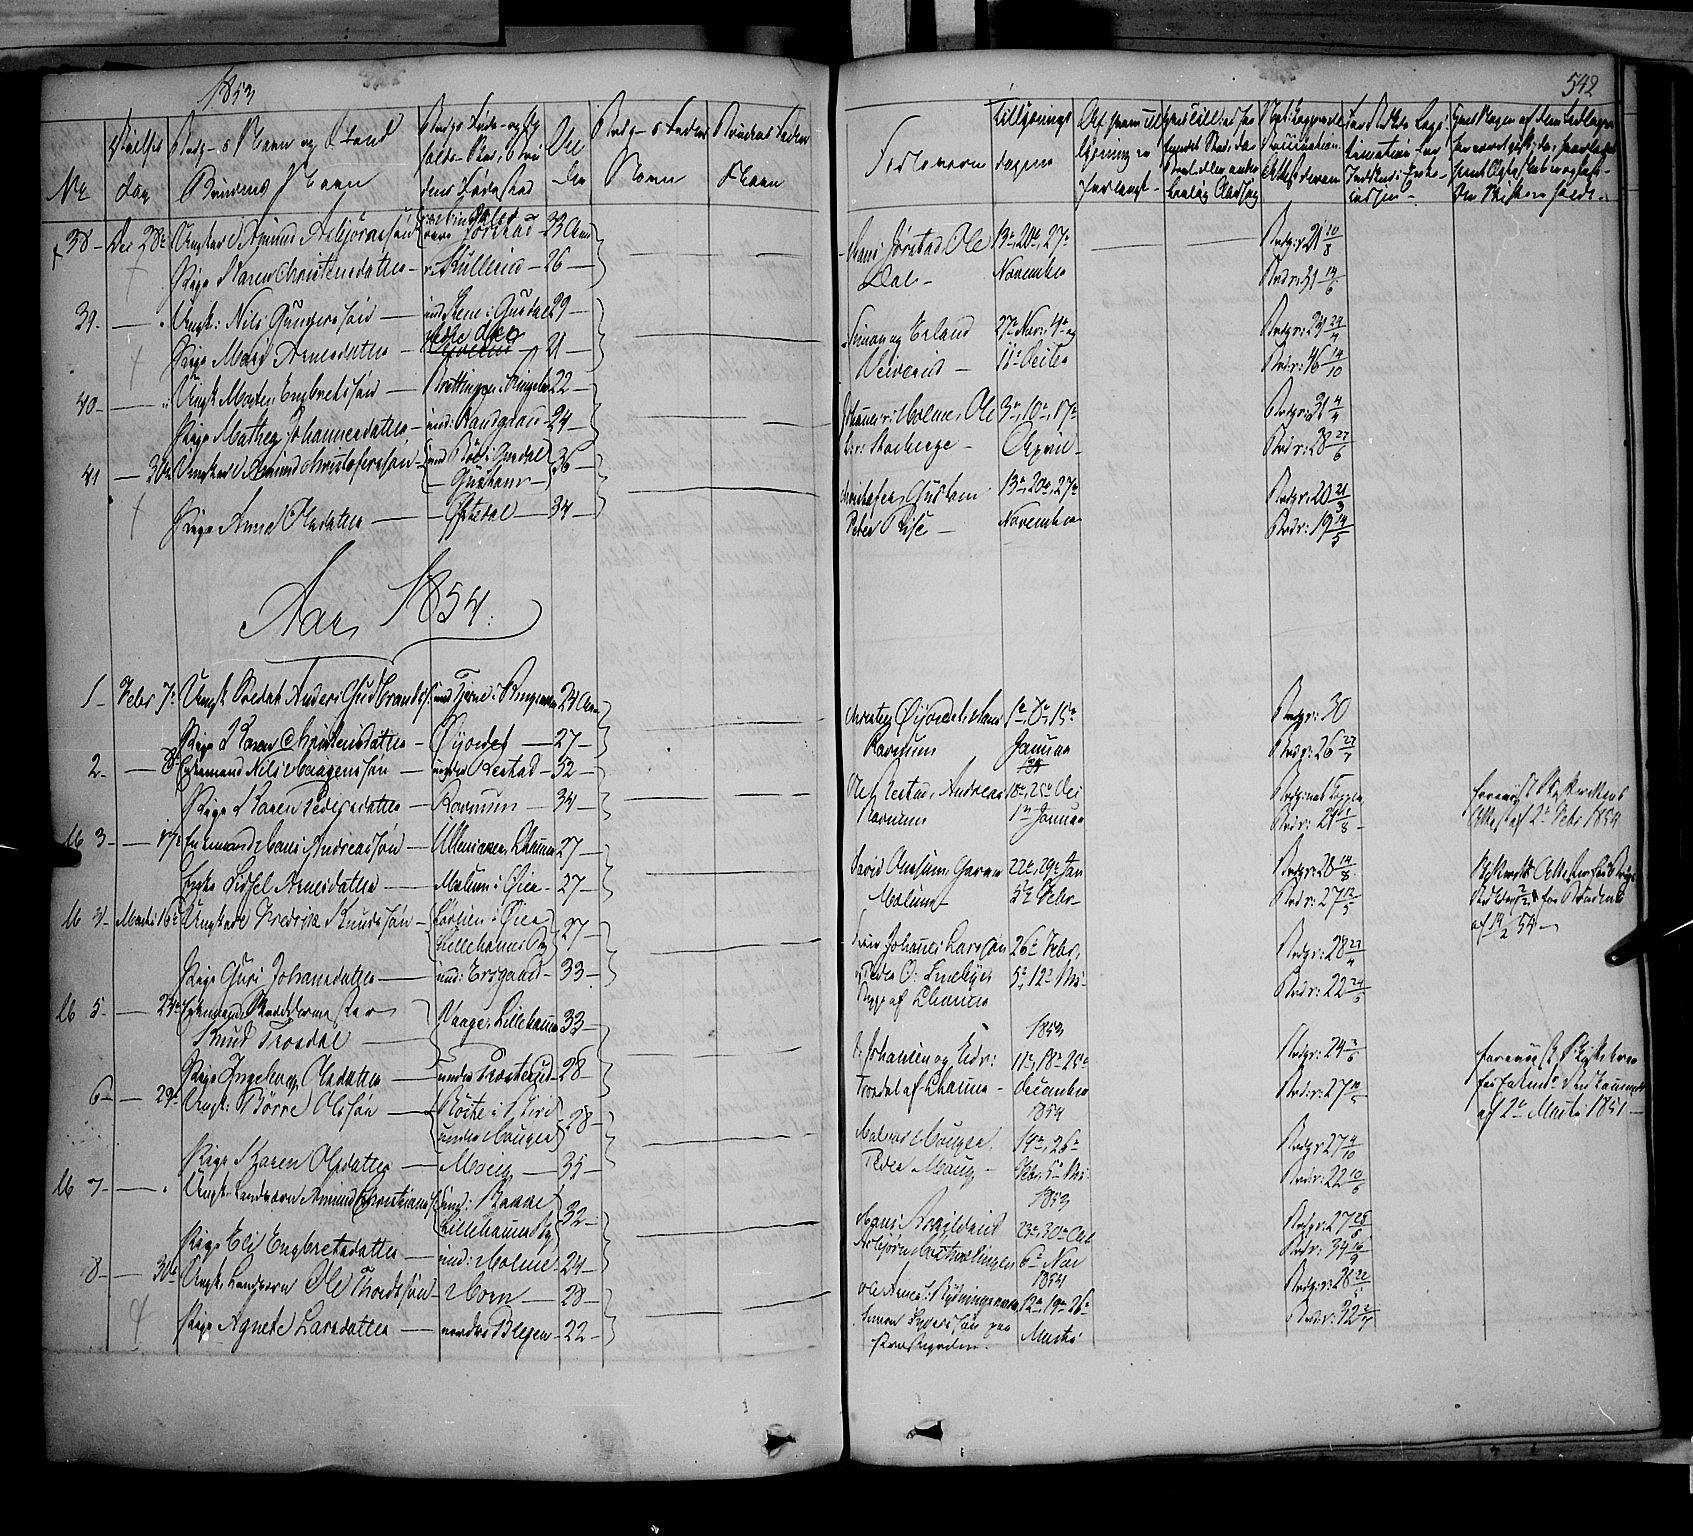 SAH, Fåberg prestekontor, Ministerialbok nr. 5, 1836-1854, s. 541-542